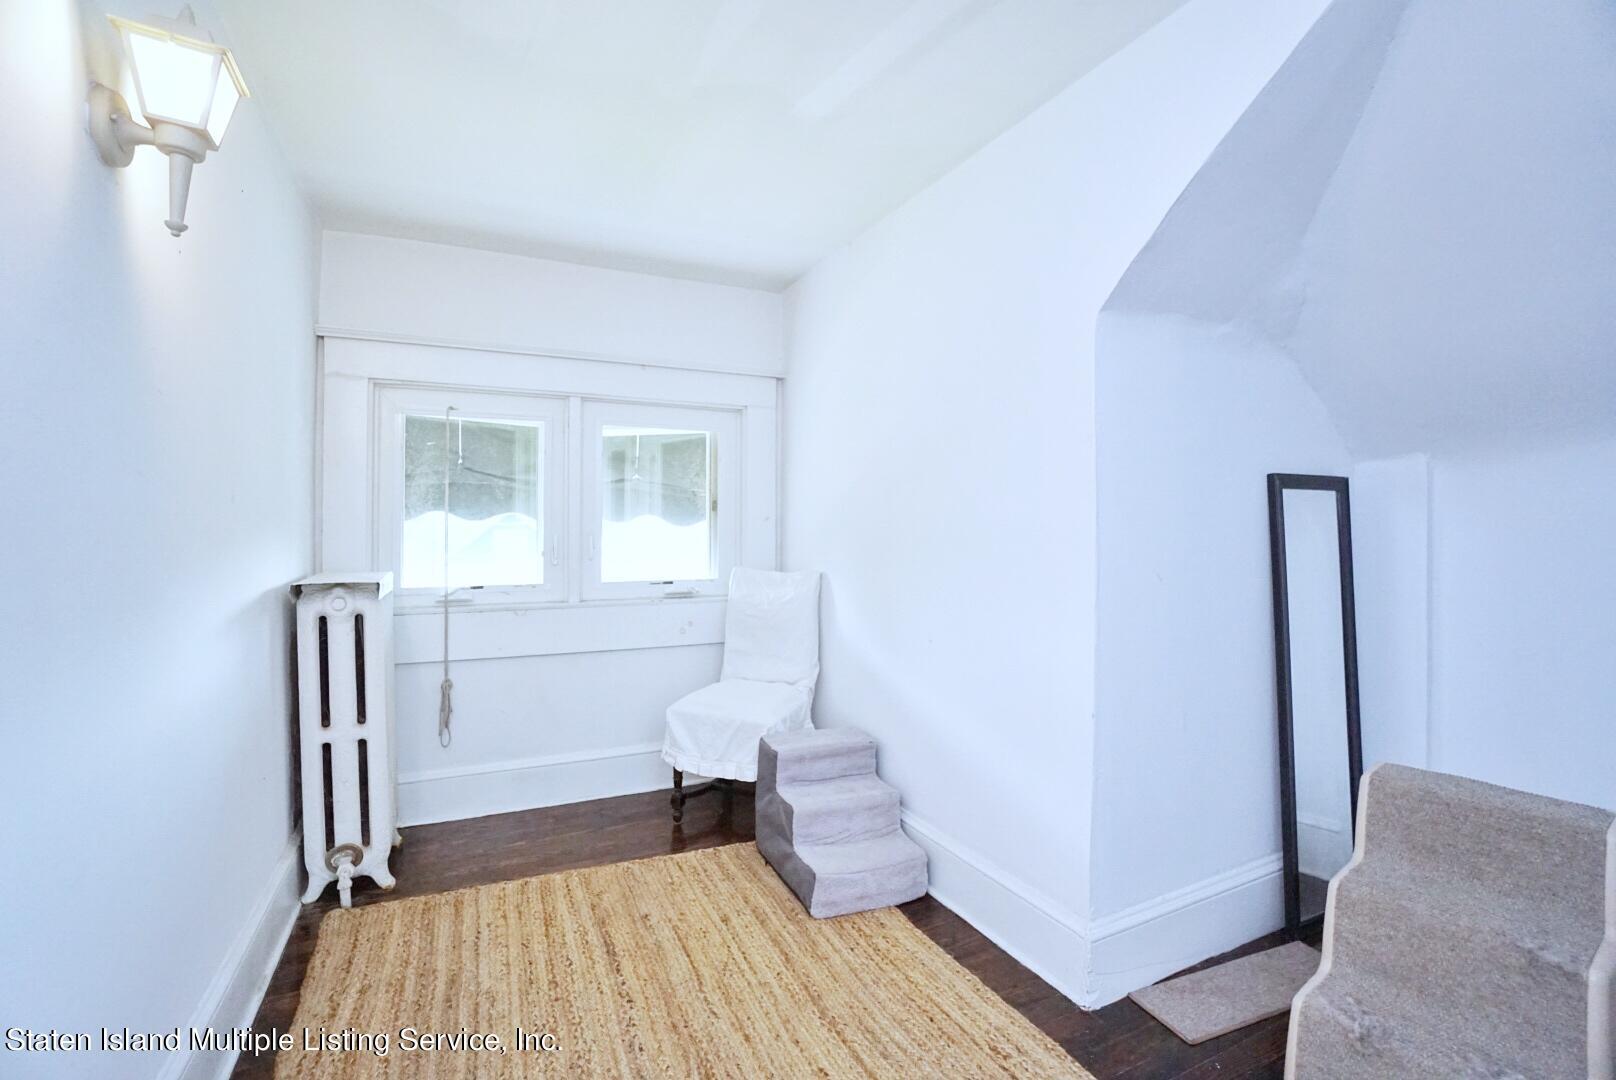 Single Family - Detached 311 Bement Avenue  Staten Island, NY 10310, MLS-1147133-32